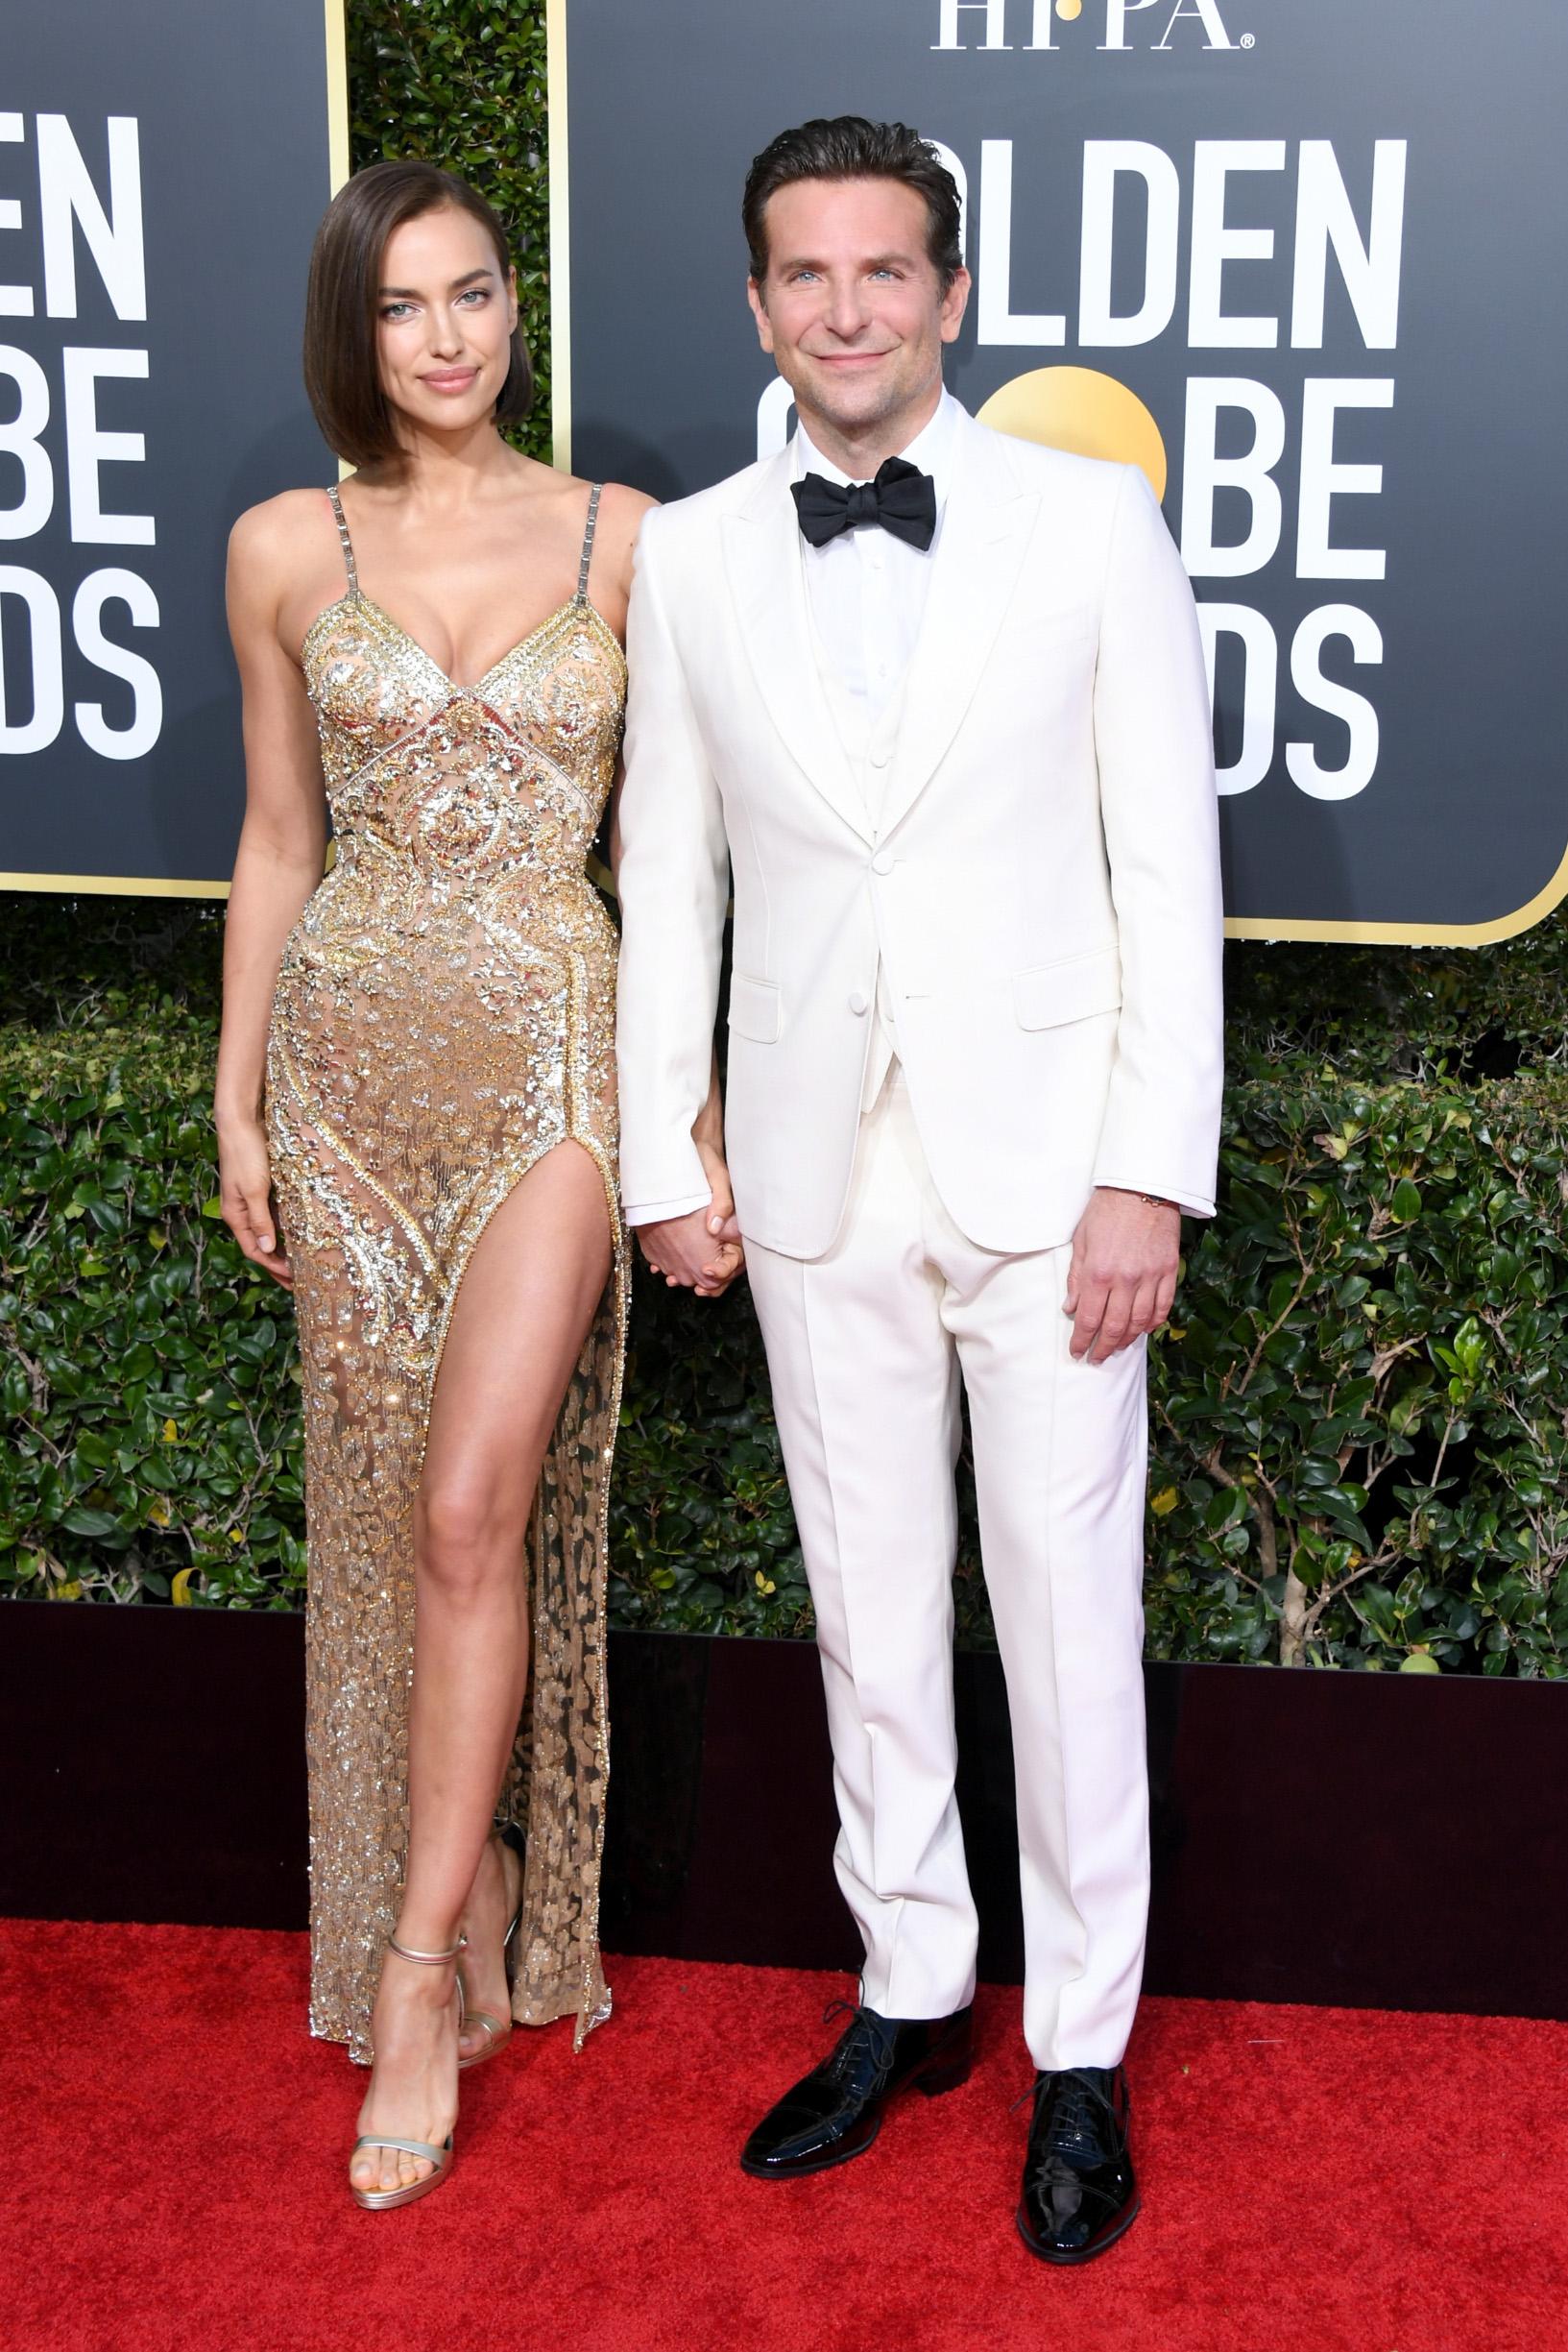 BEVERLY HILLS, CA - JANUARY 06:  Irina Shayk and Bradley Cooper attend the 76th Annual Golden Globe Awards at The Beverly Hilton Hotel on January 6, 2019 in Beverly Hills, California.  (Photo by Jon Kopaloff/Getty Images)